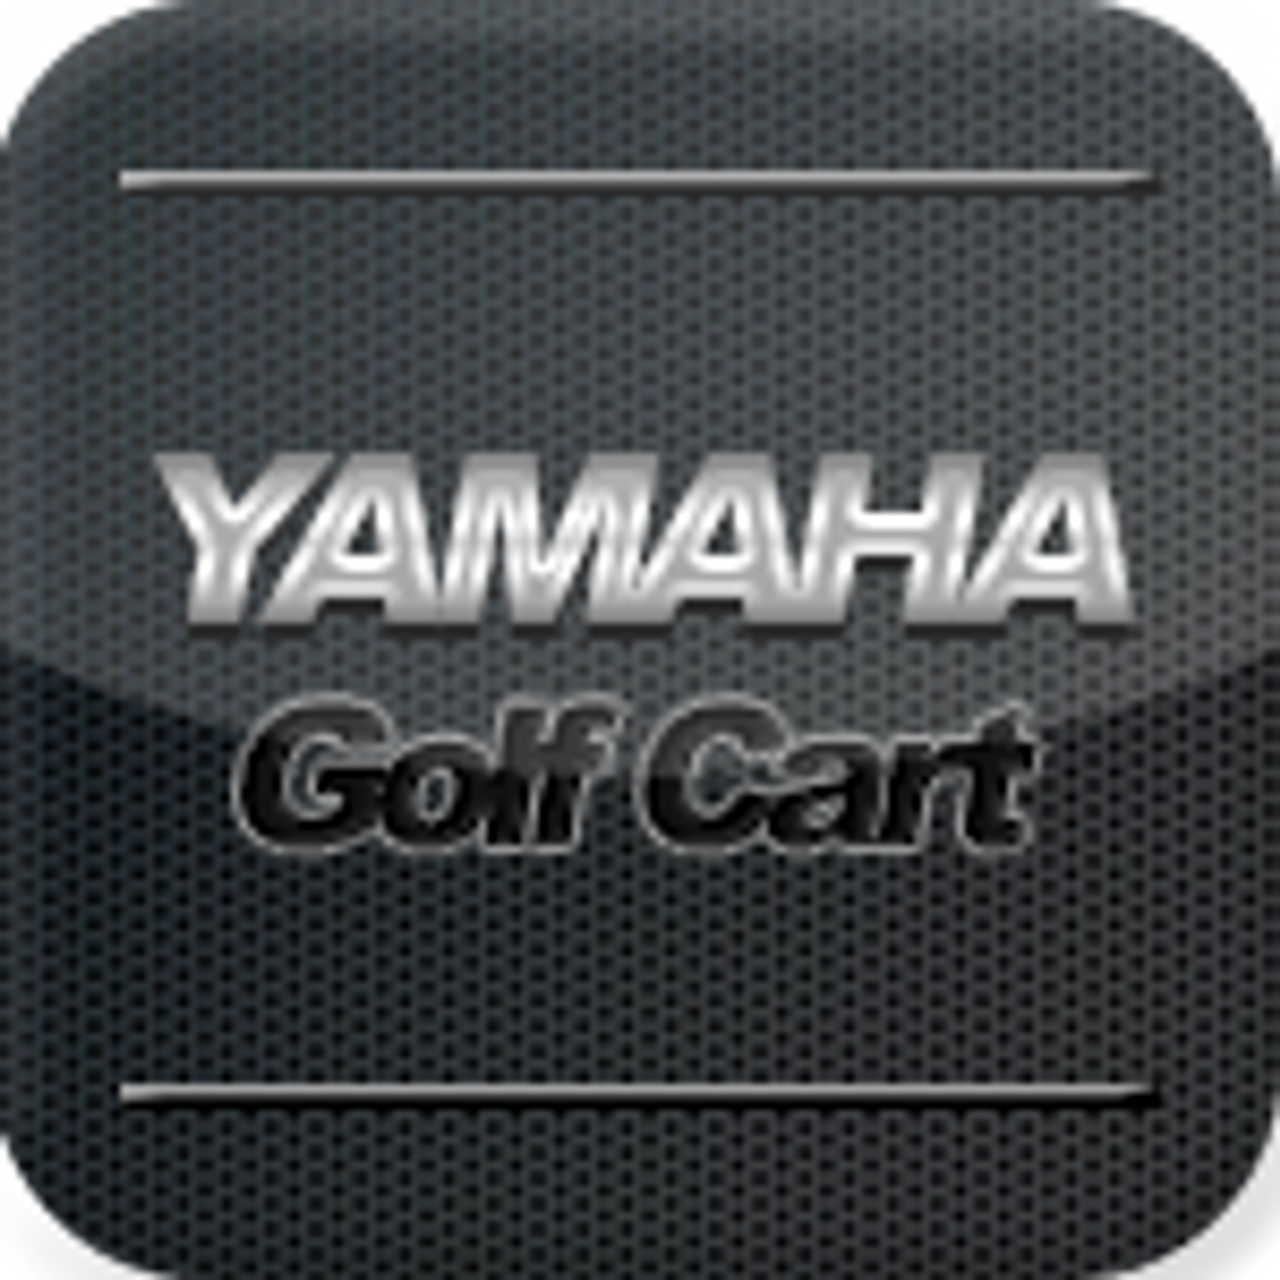 Yamaha Carburetors